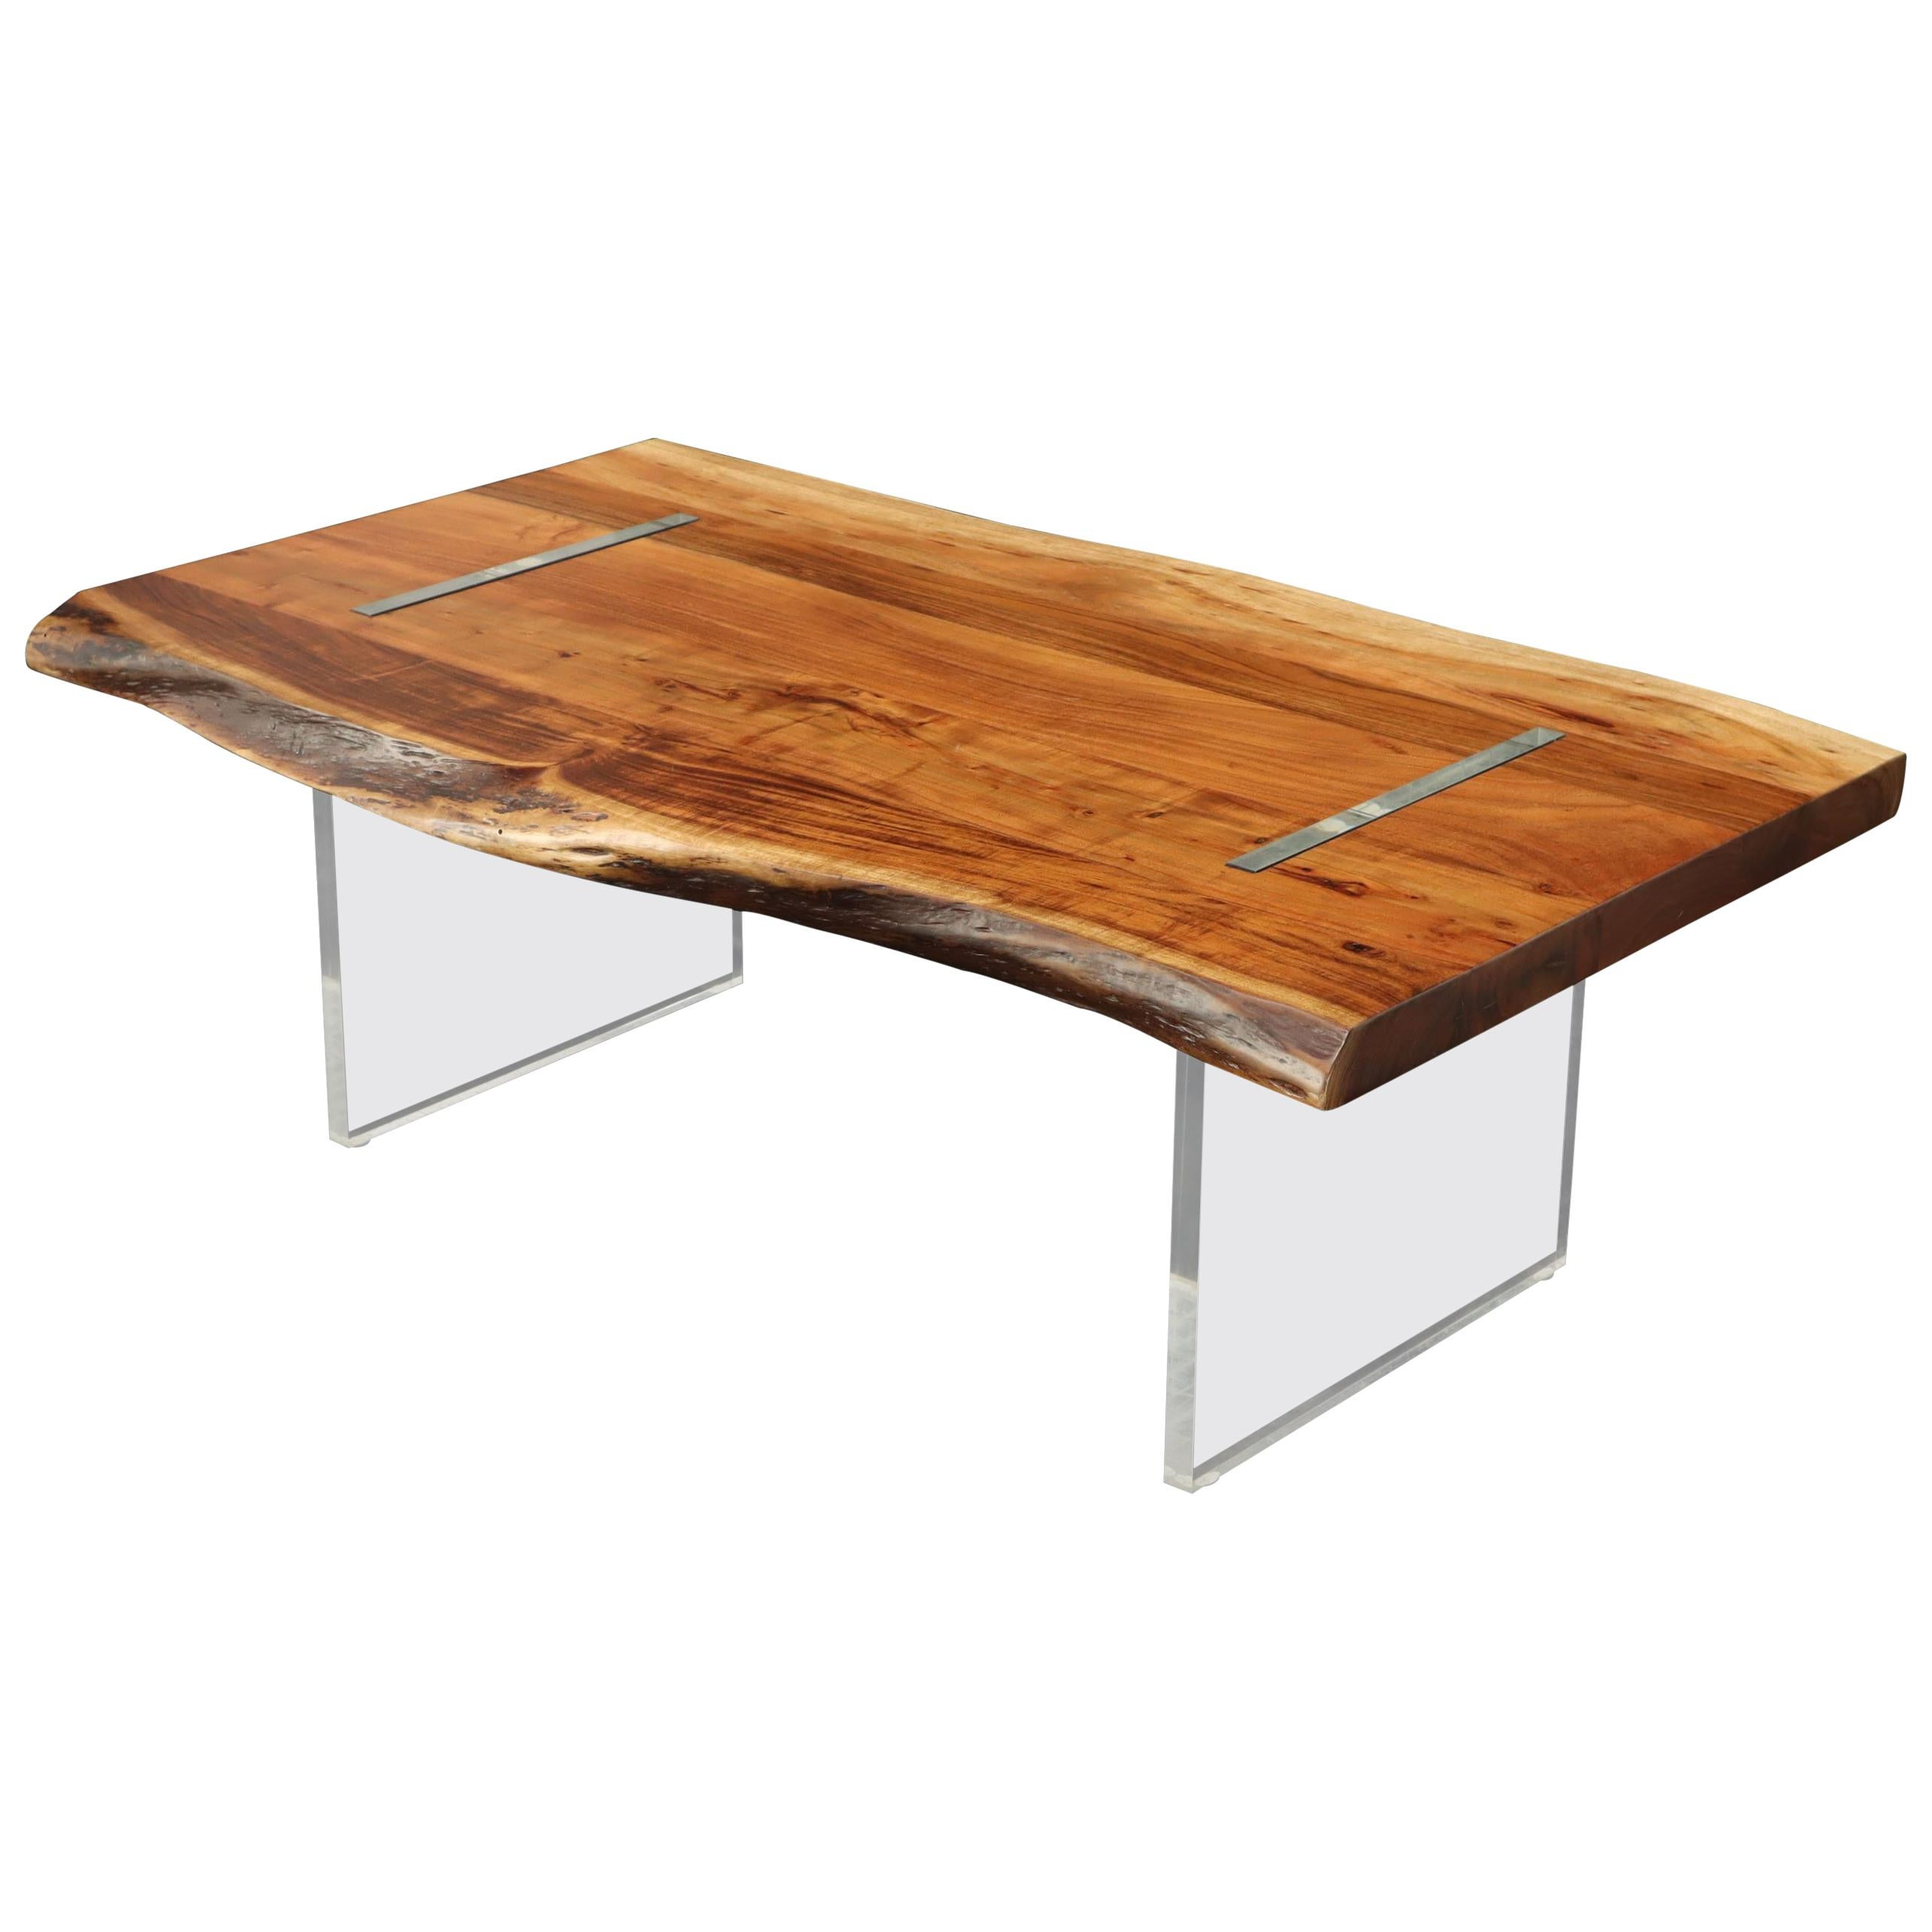 Large Heavy Solid Teak Slab Floating Top Coffee Table on Lucite Legs